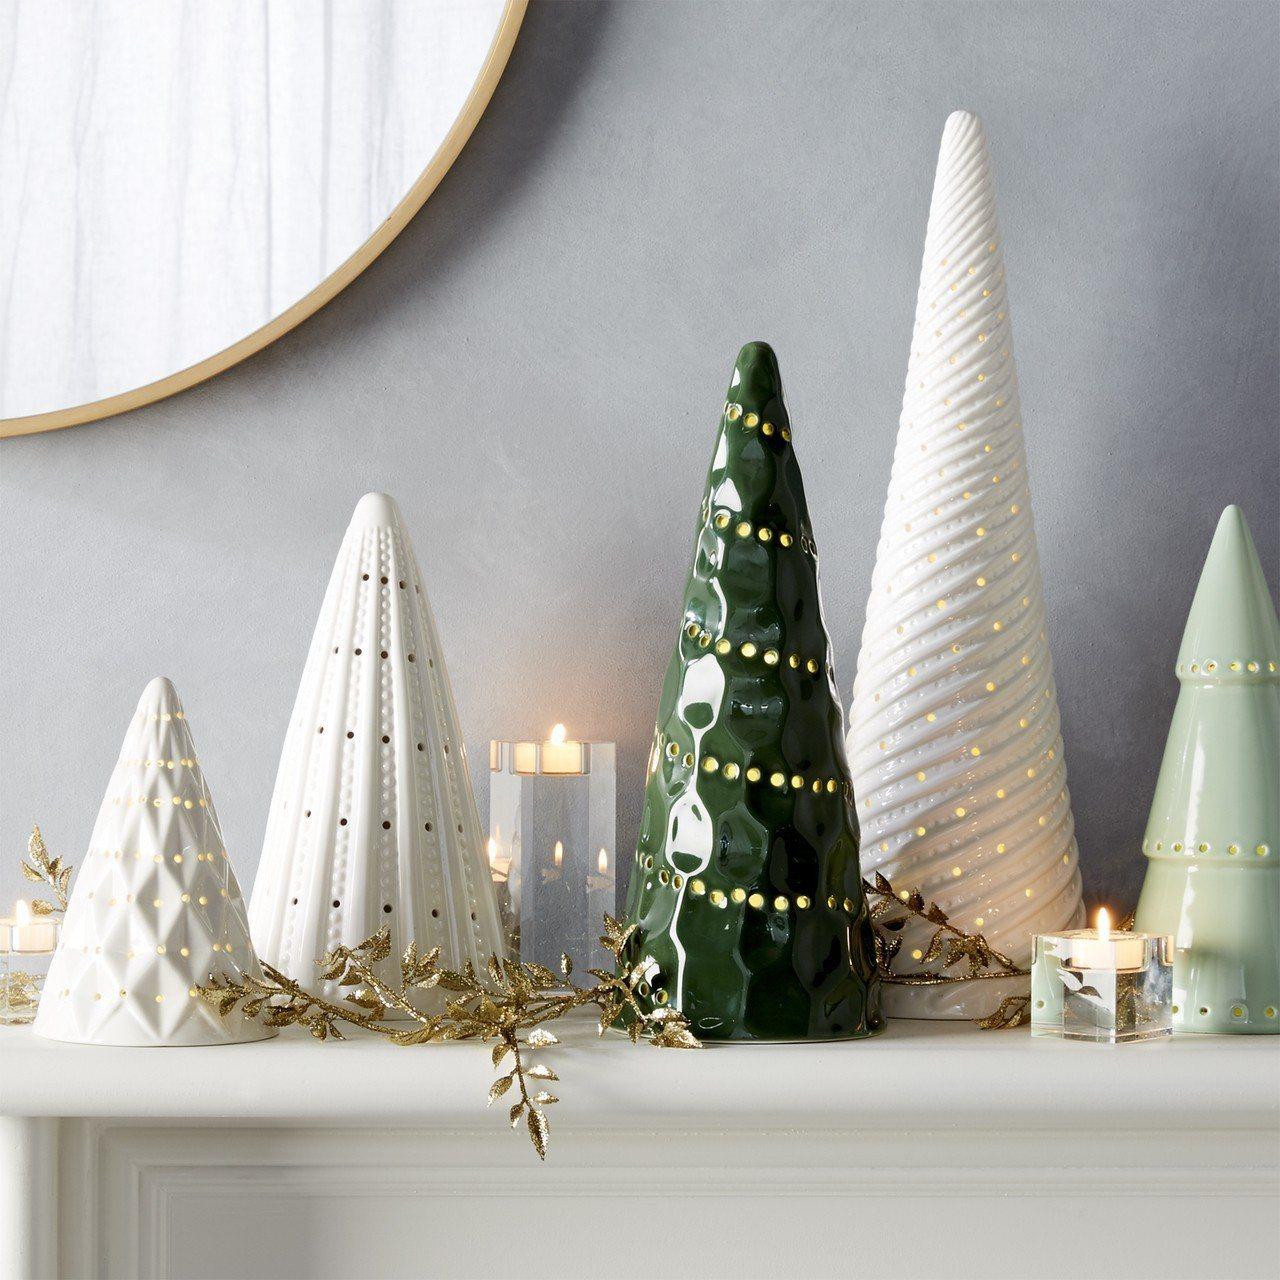 Crate and Barrel LED陶瓷聖誕樹擺飾,建議售價1,250~2,...